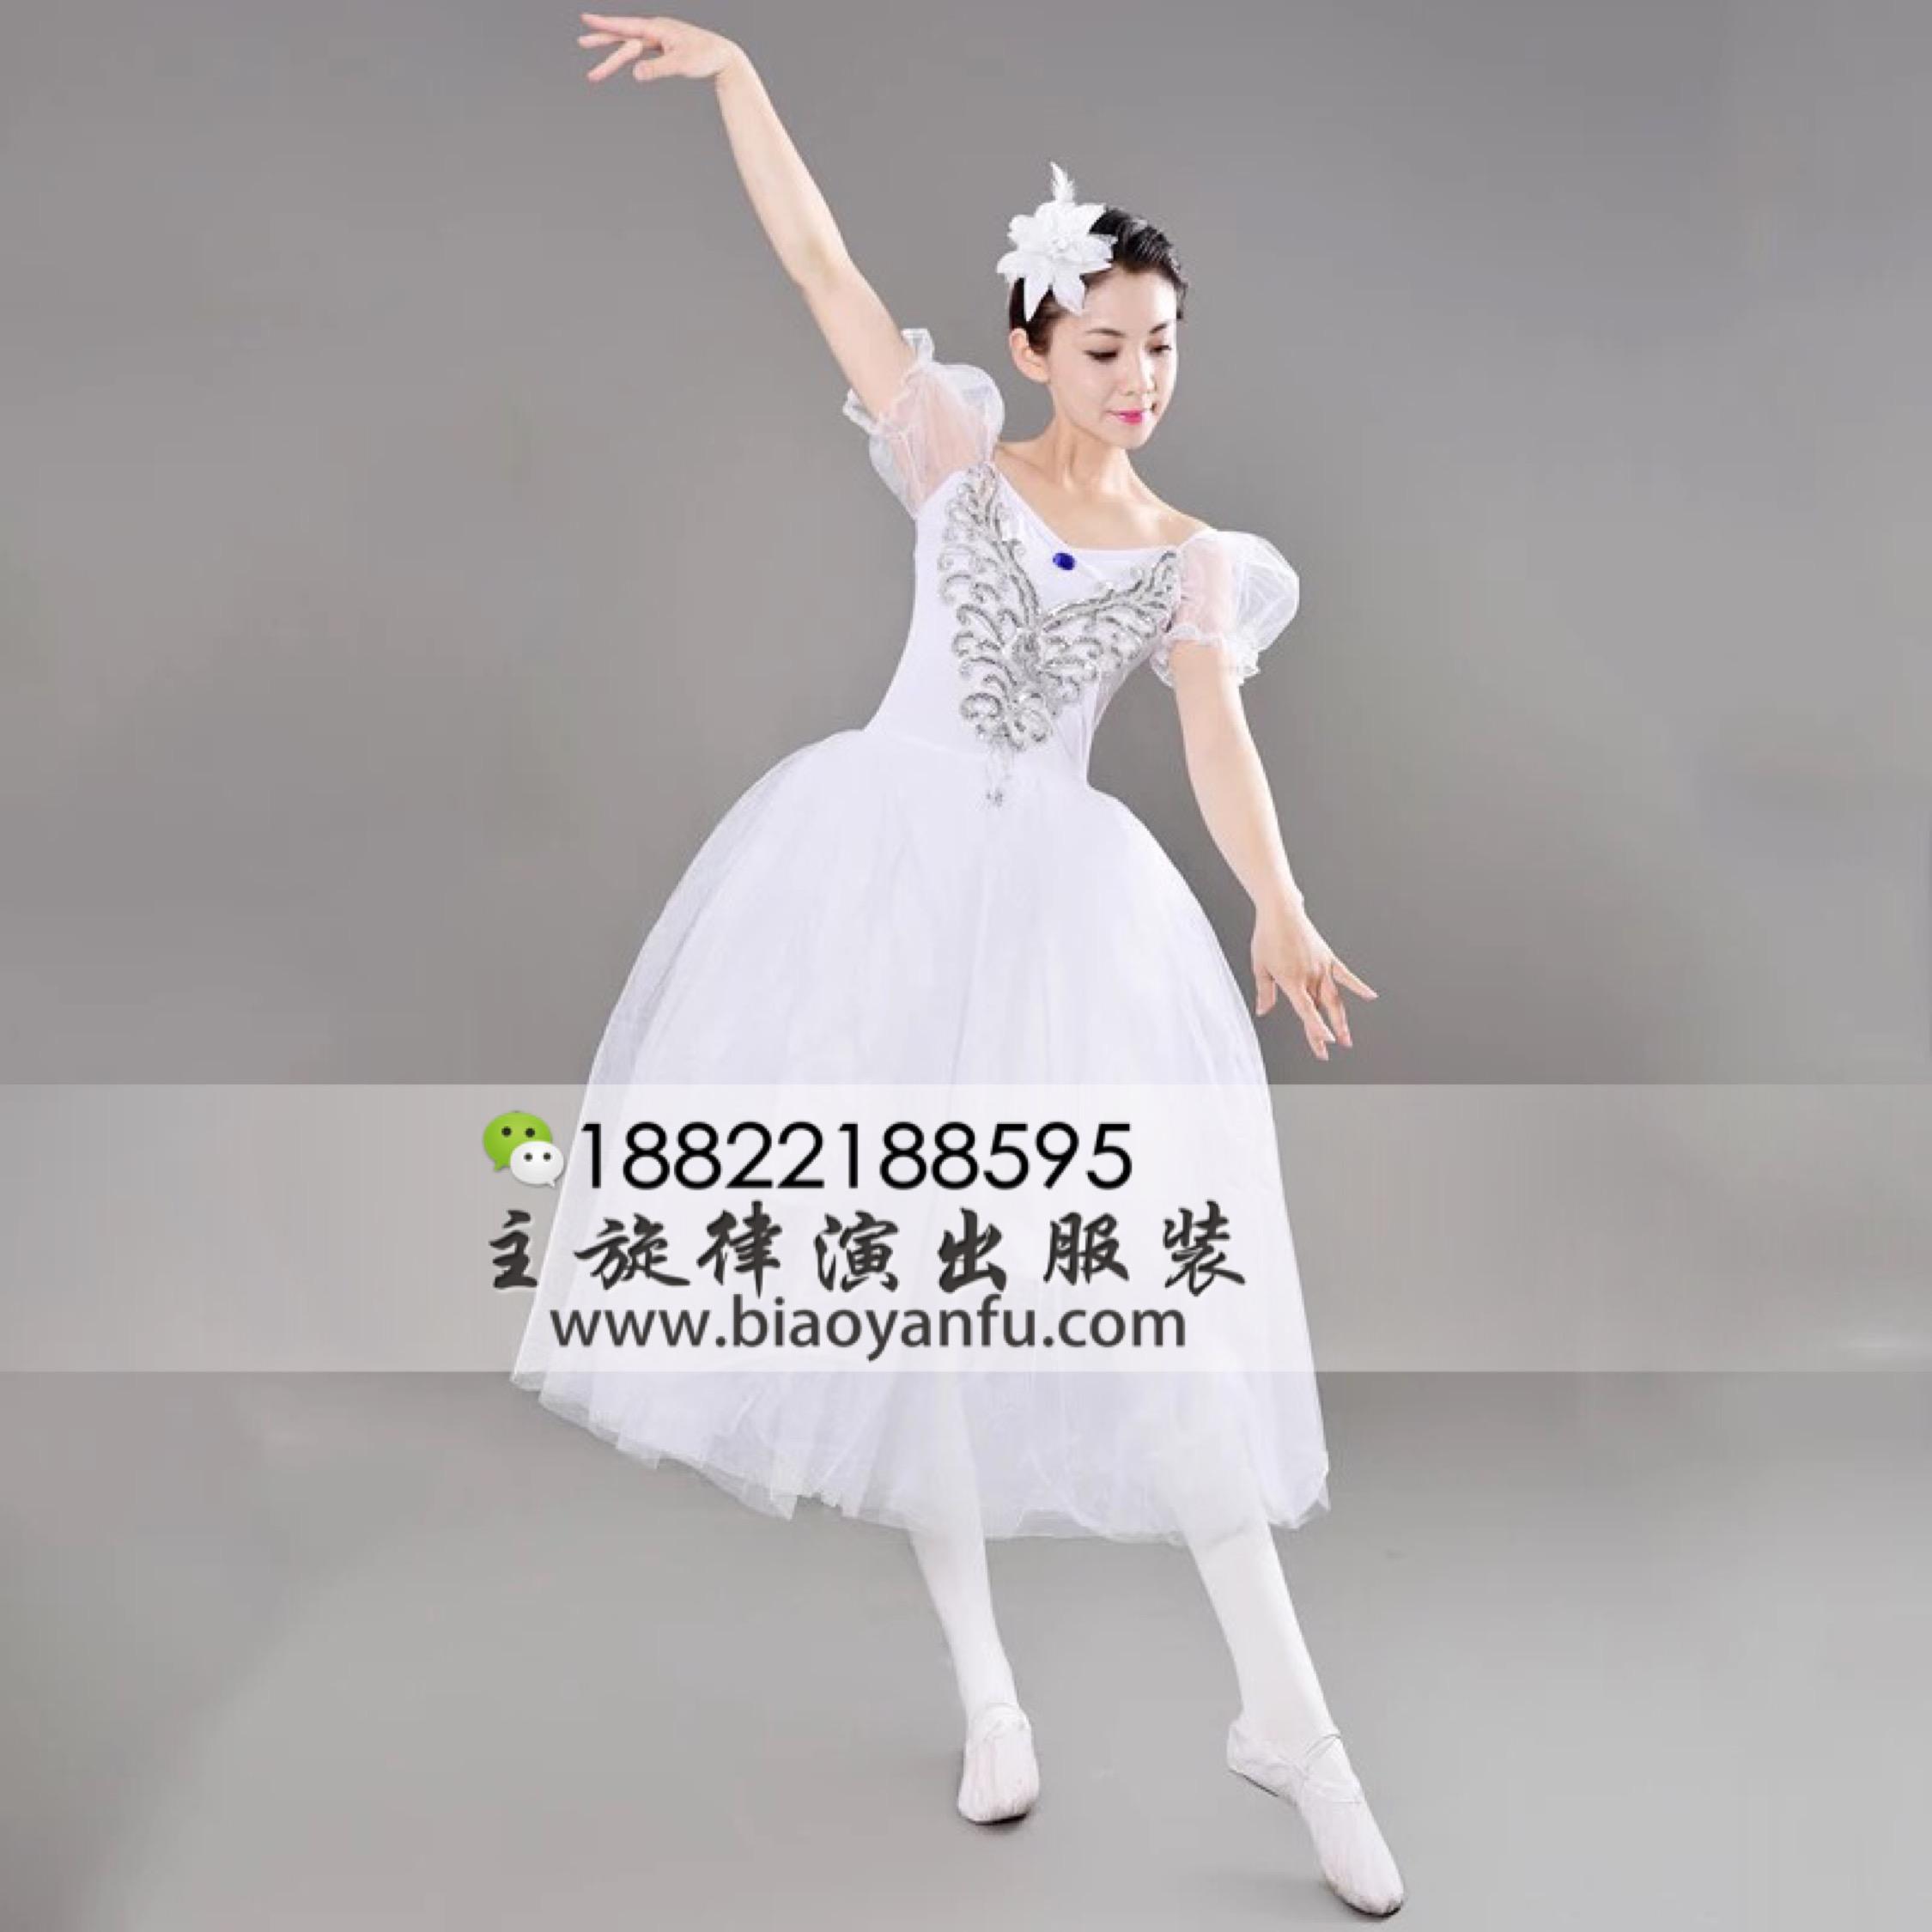 X-0140芭蕾舞乐动体育app咋样